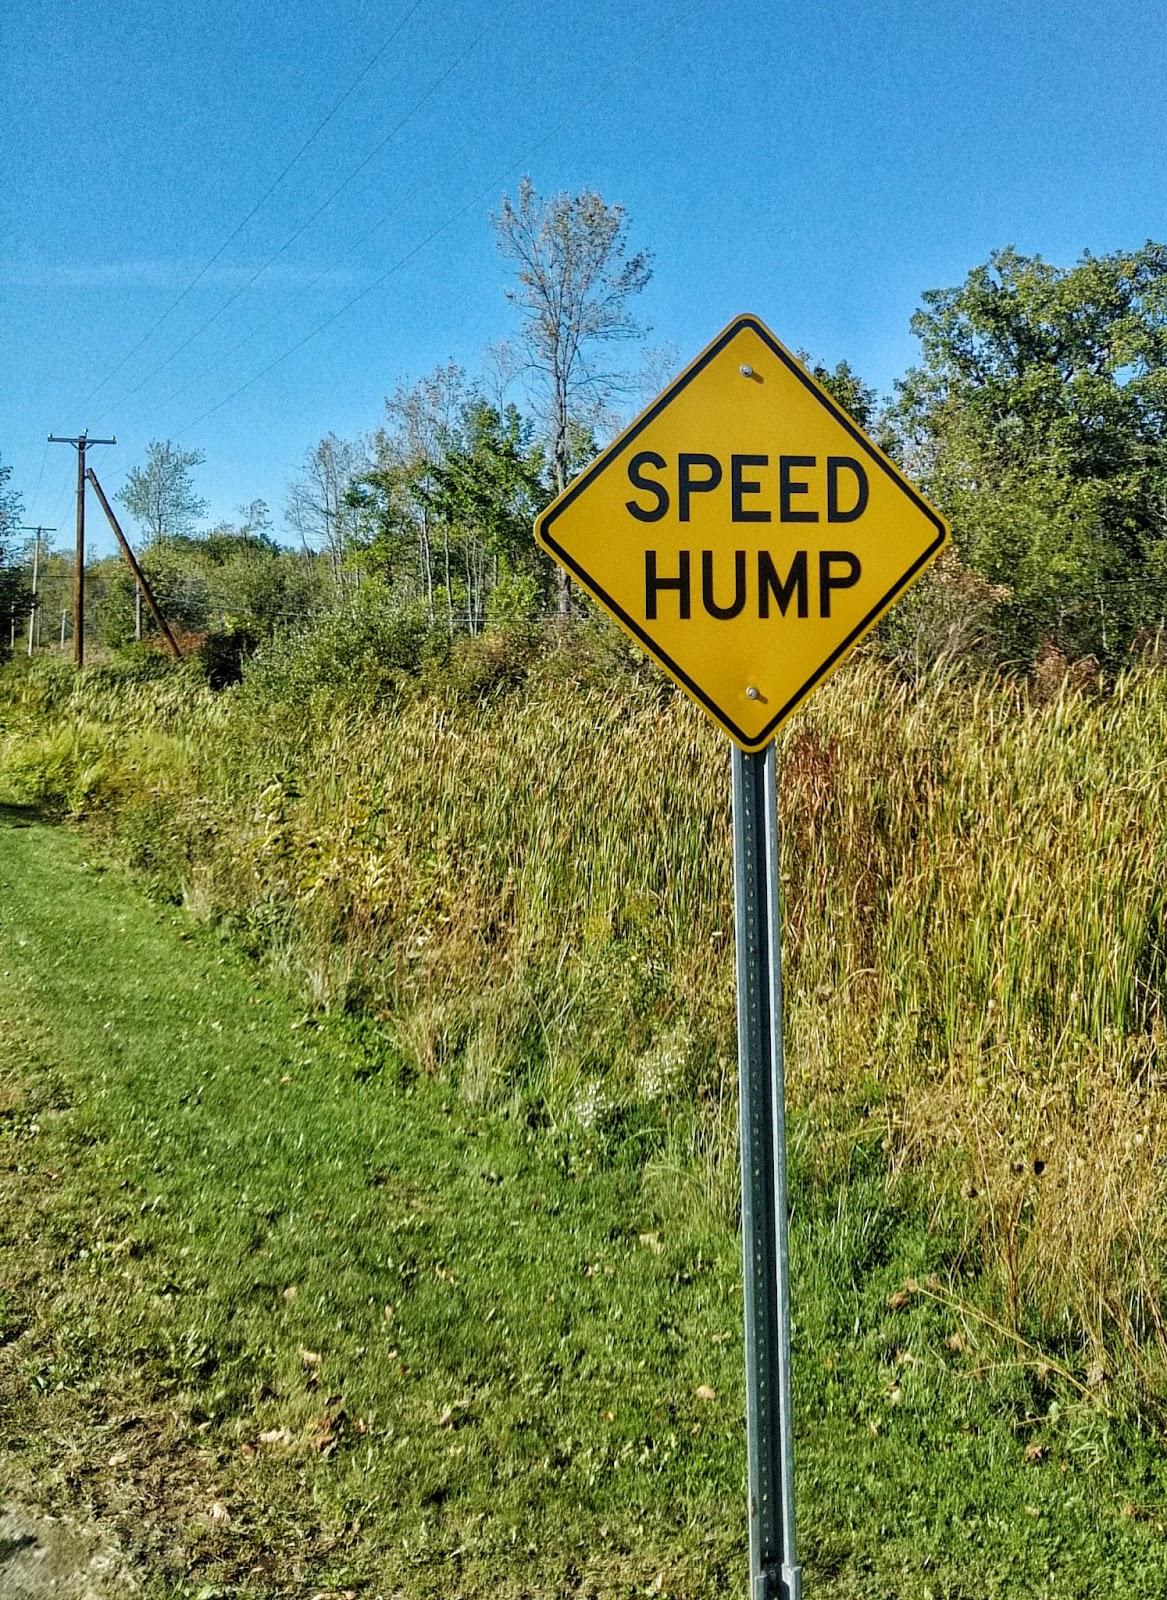 Why are euphemisms bad?